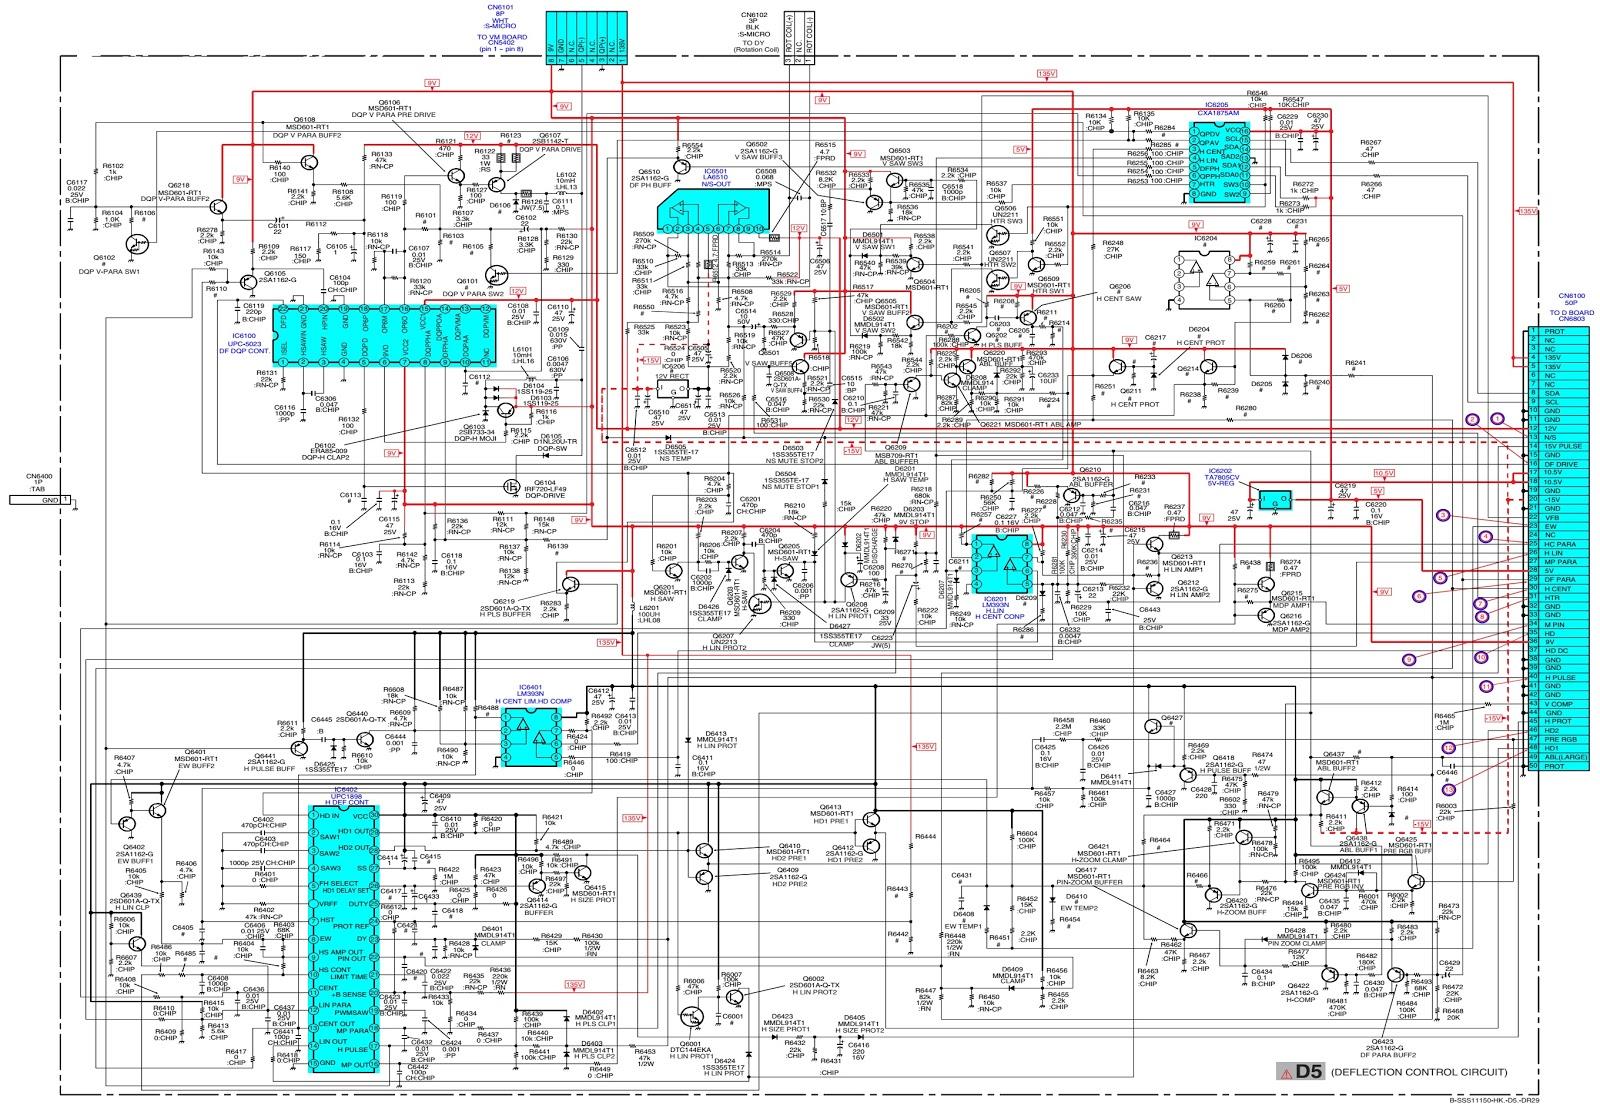 Electro Help  Sony Kv Dr29m93 Trinitron Color Tv  U2013 Service